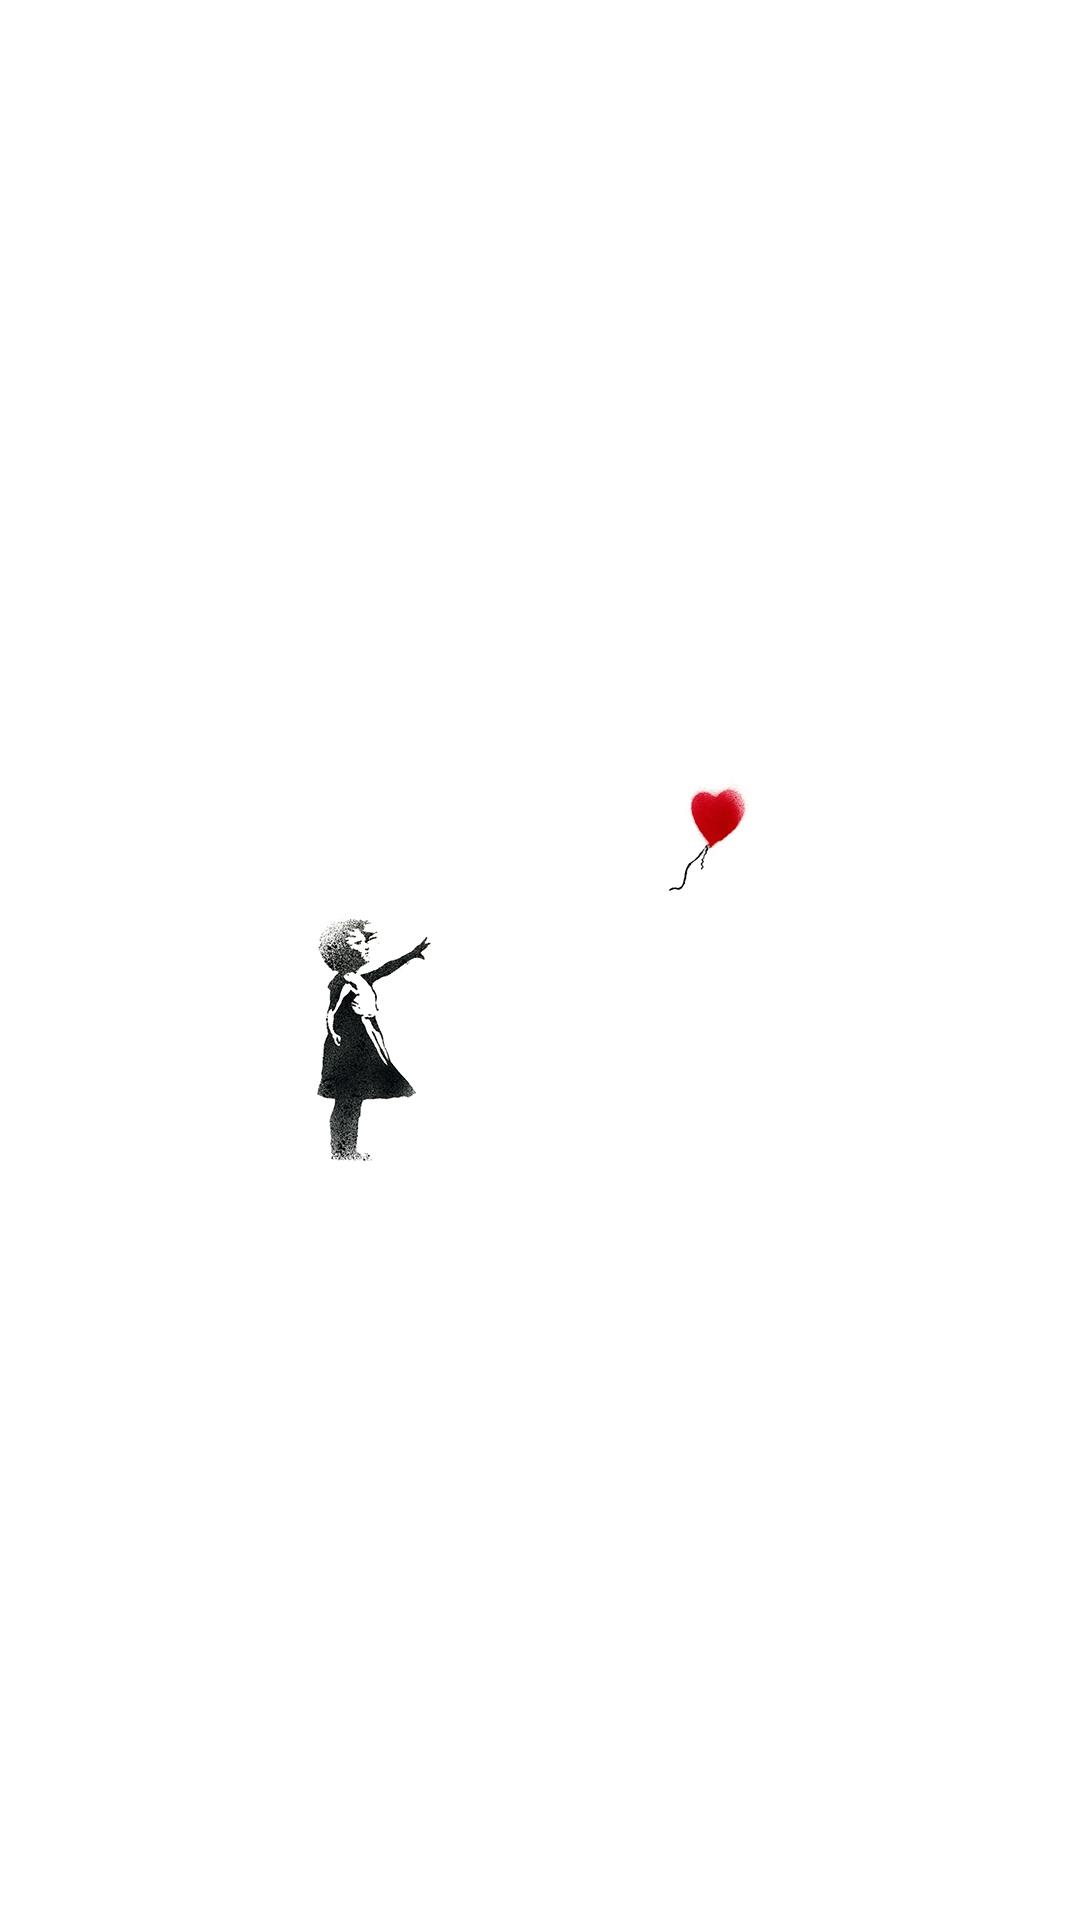 iPhone wallpaper banksy girl of hope Banksy